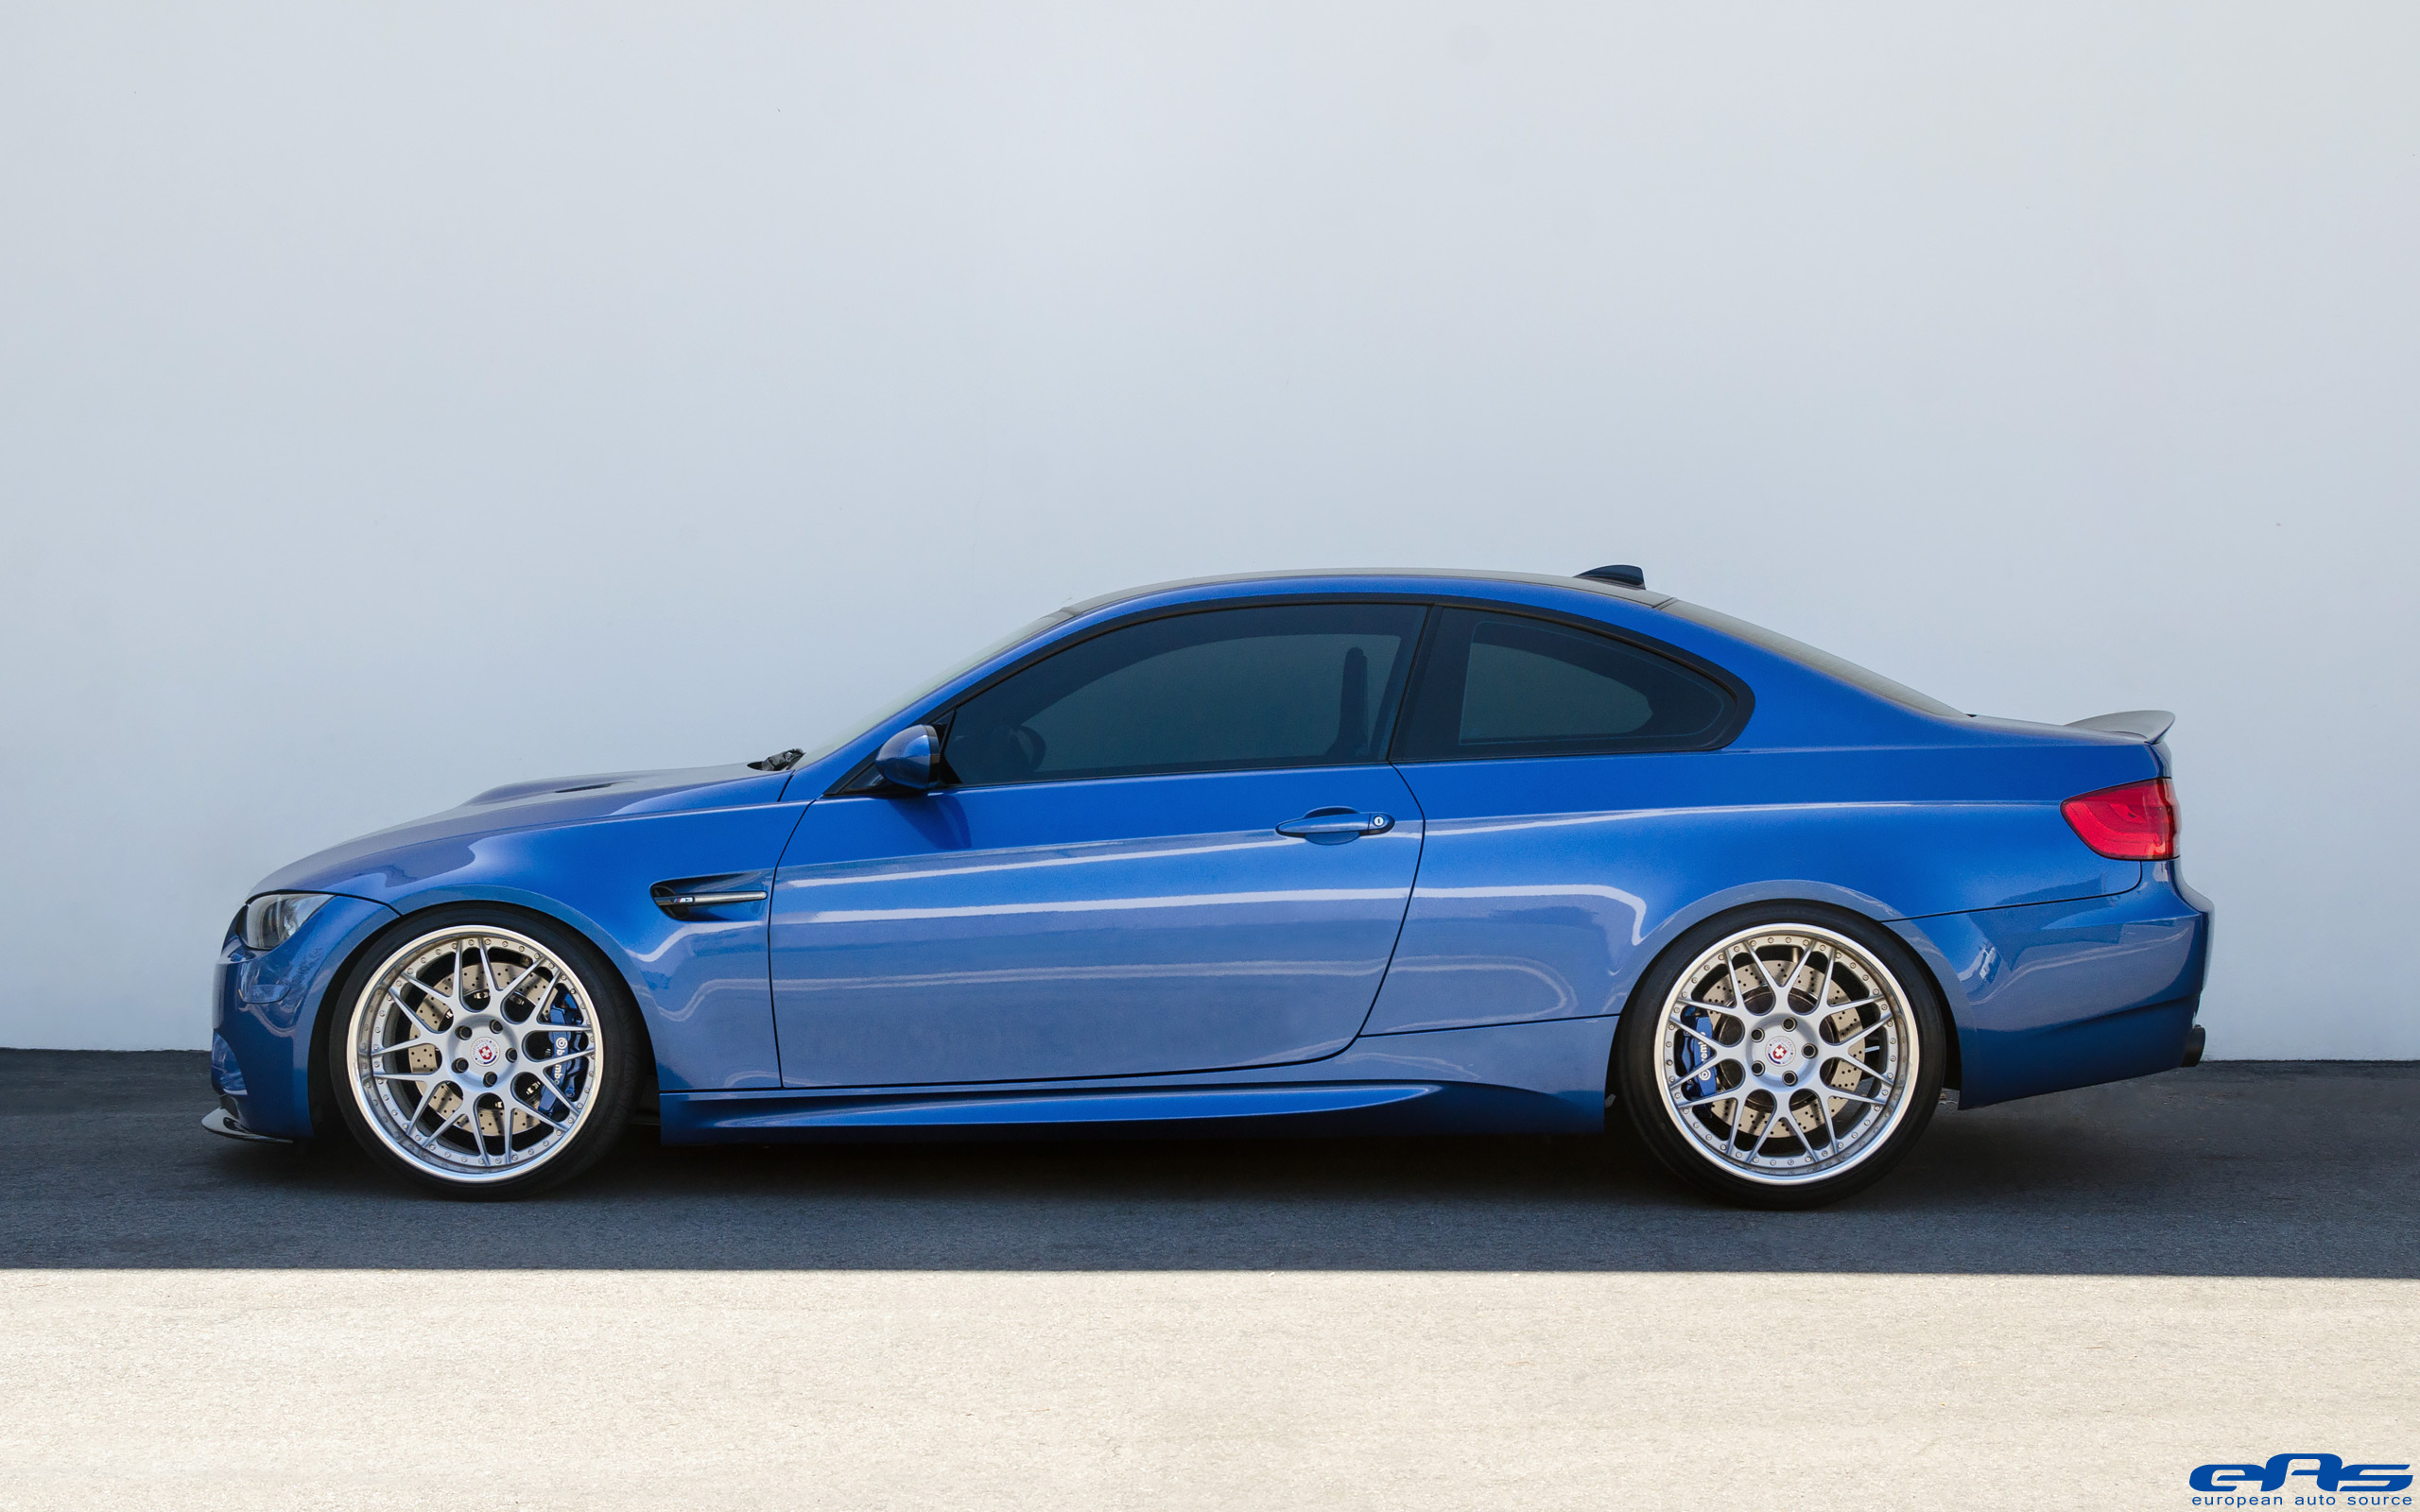 Monte carlo blue inidual e92 bmw m3 by european auto source 7